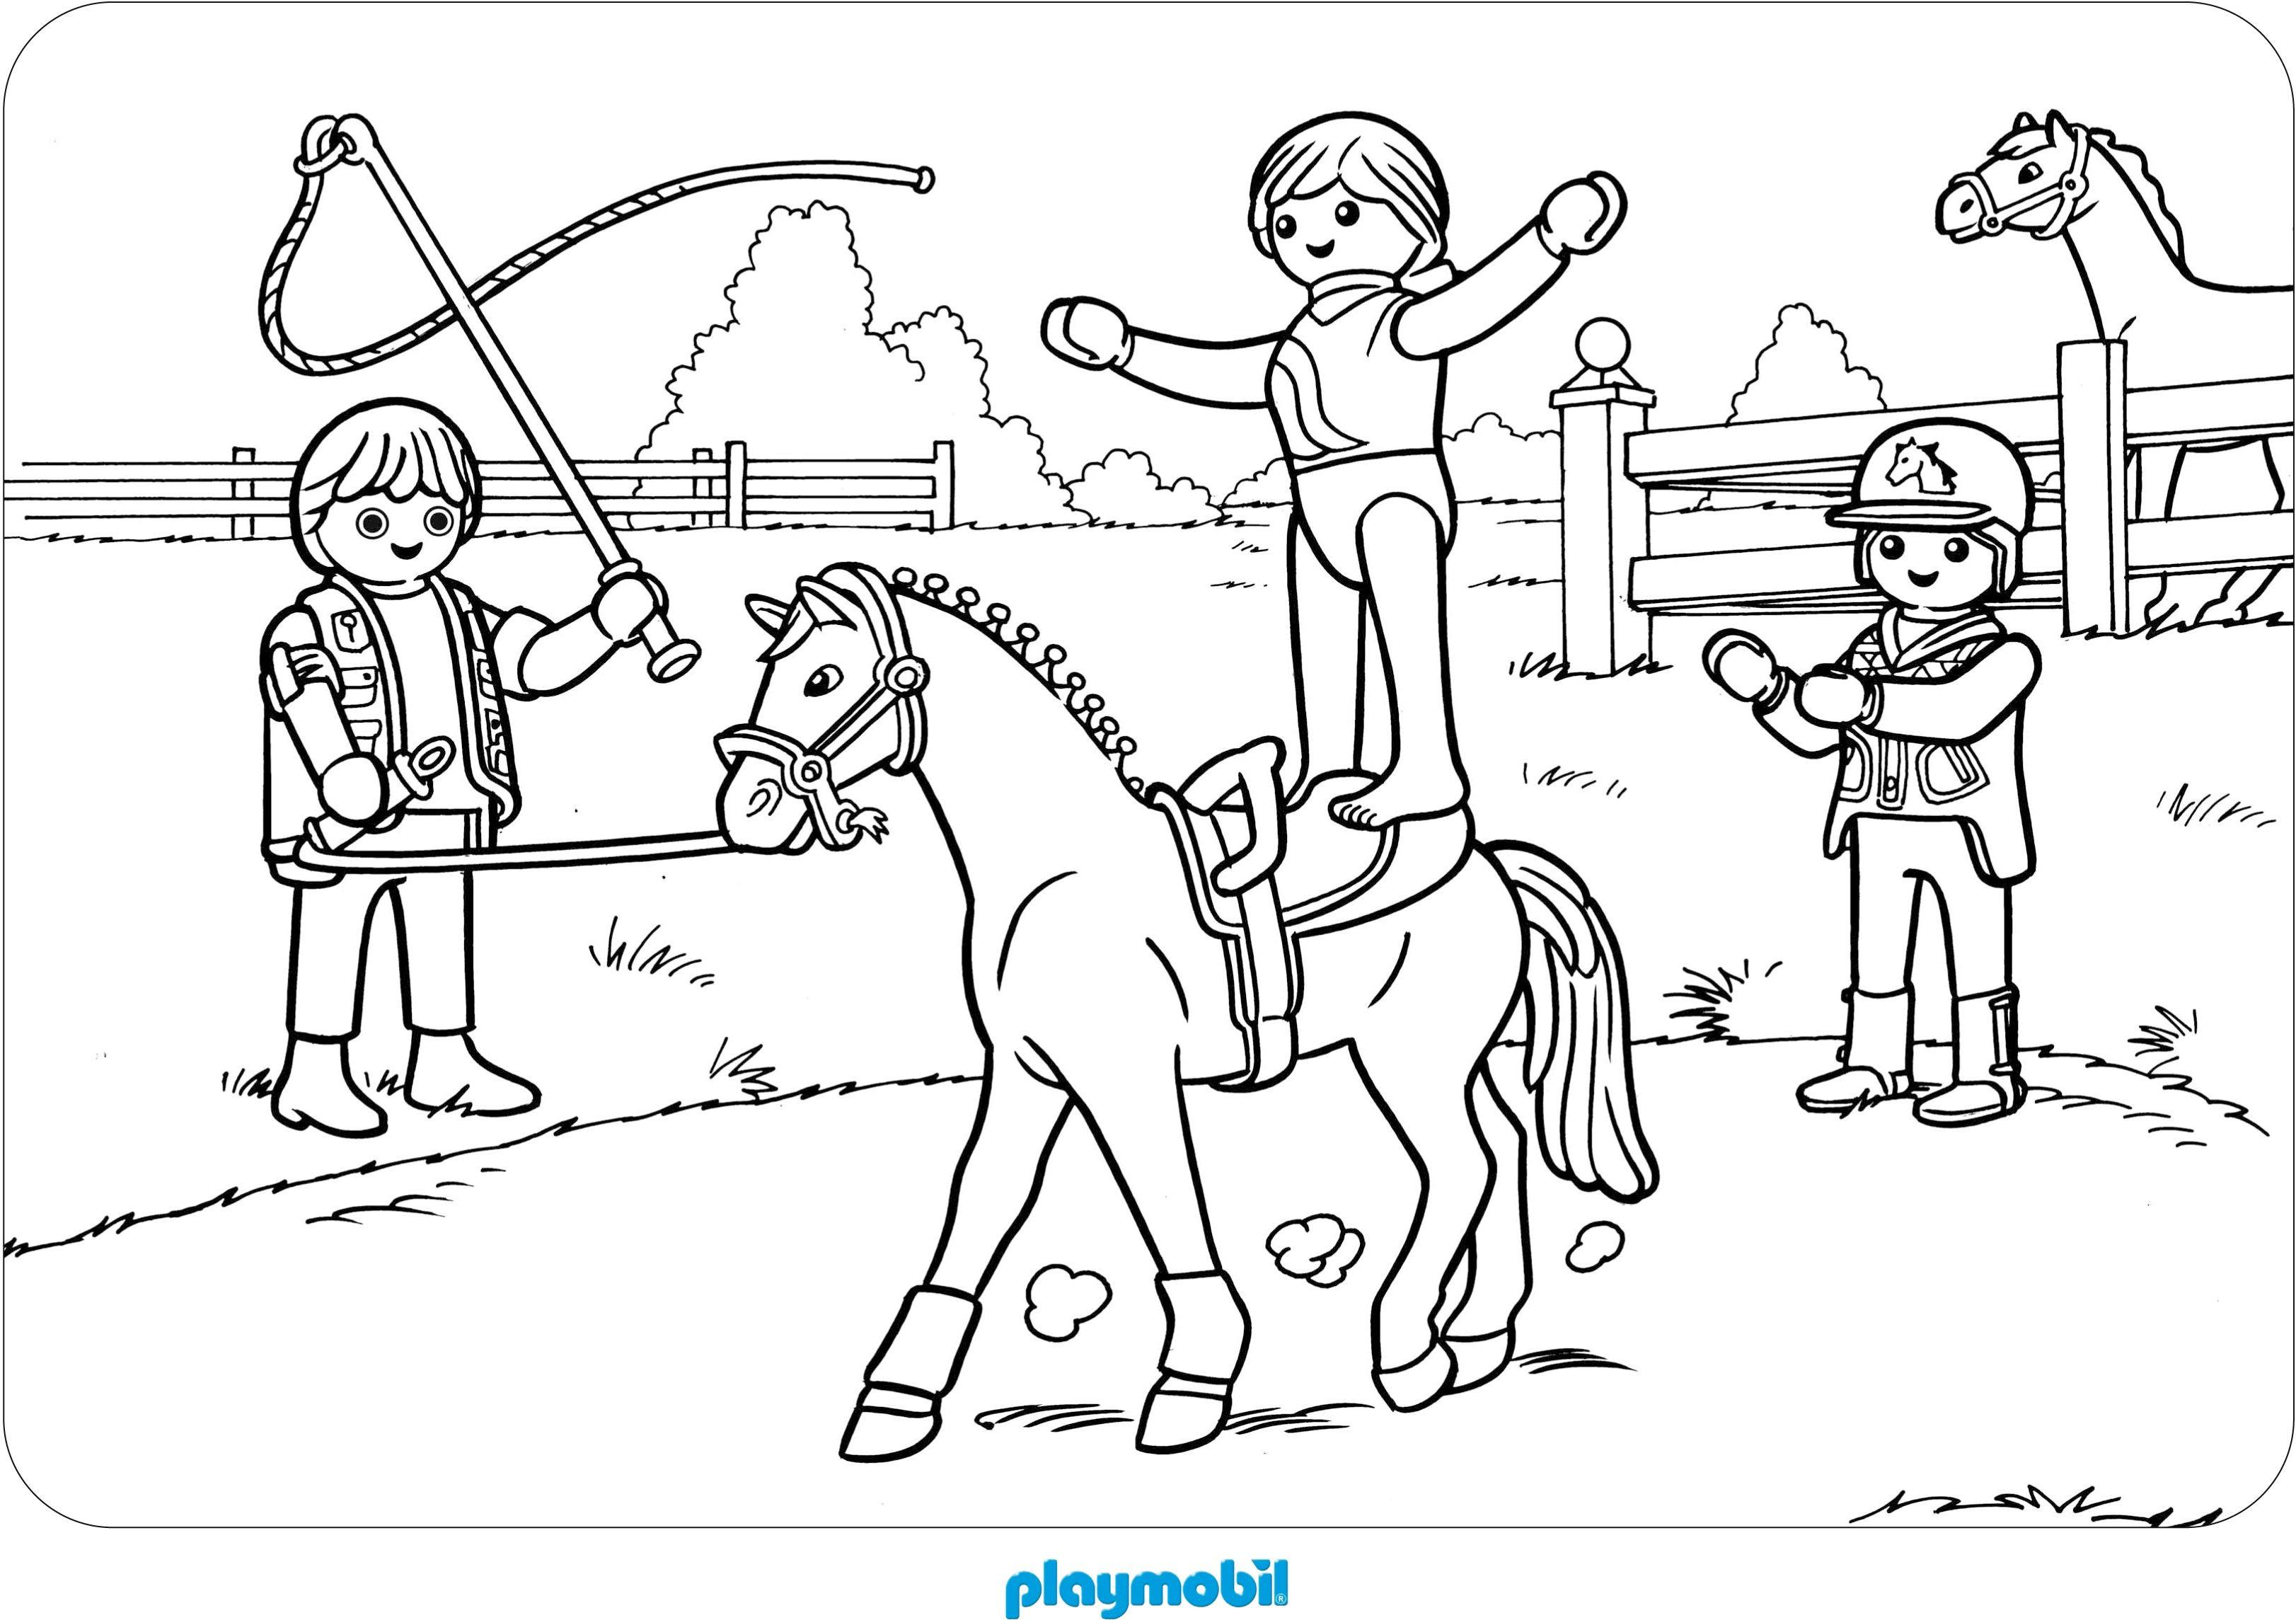 Ausmalbilder Pferd  Playmobil Ausmalbilder Pferde Lego